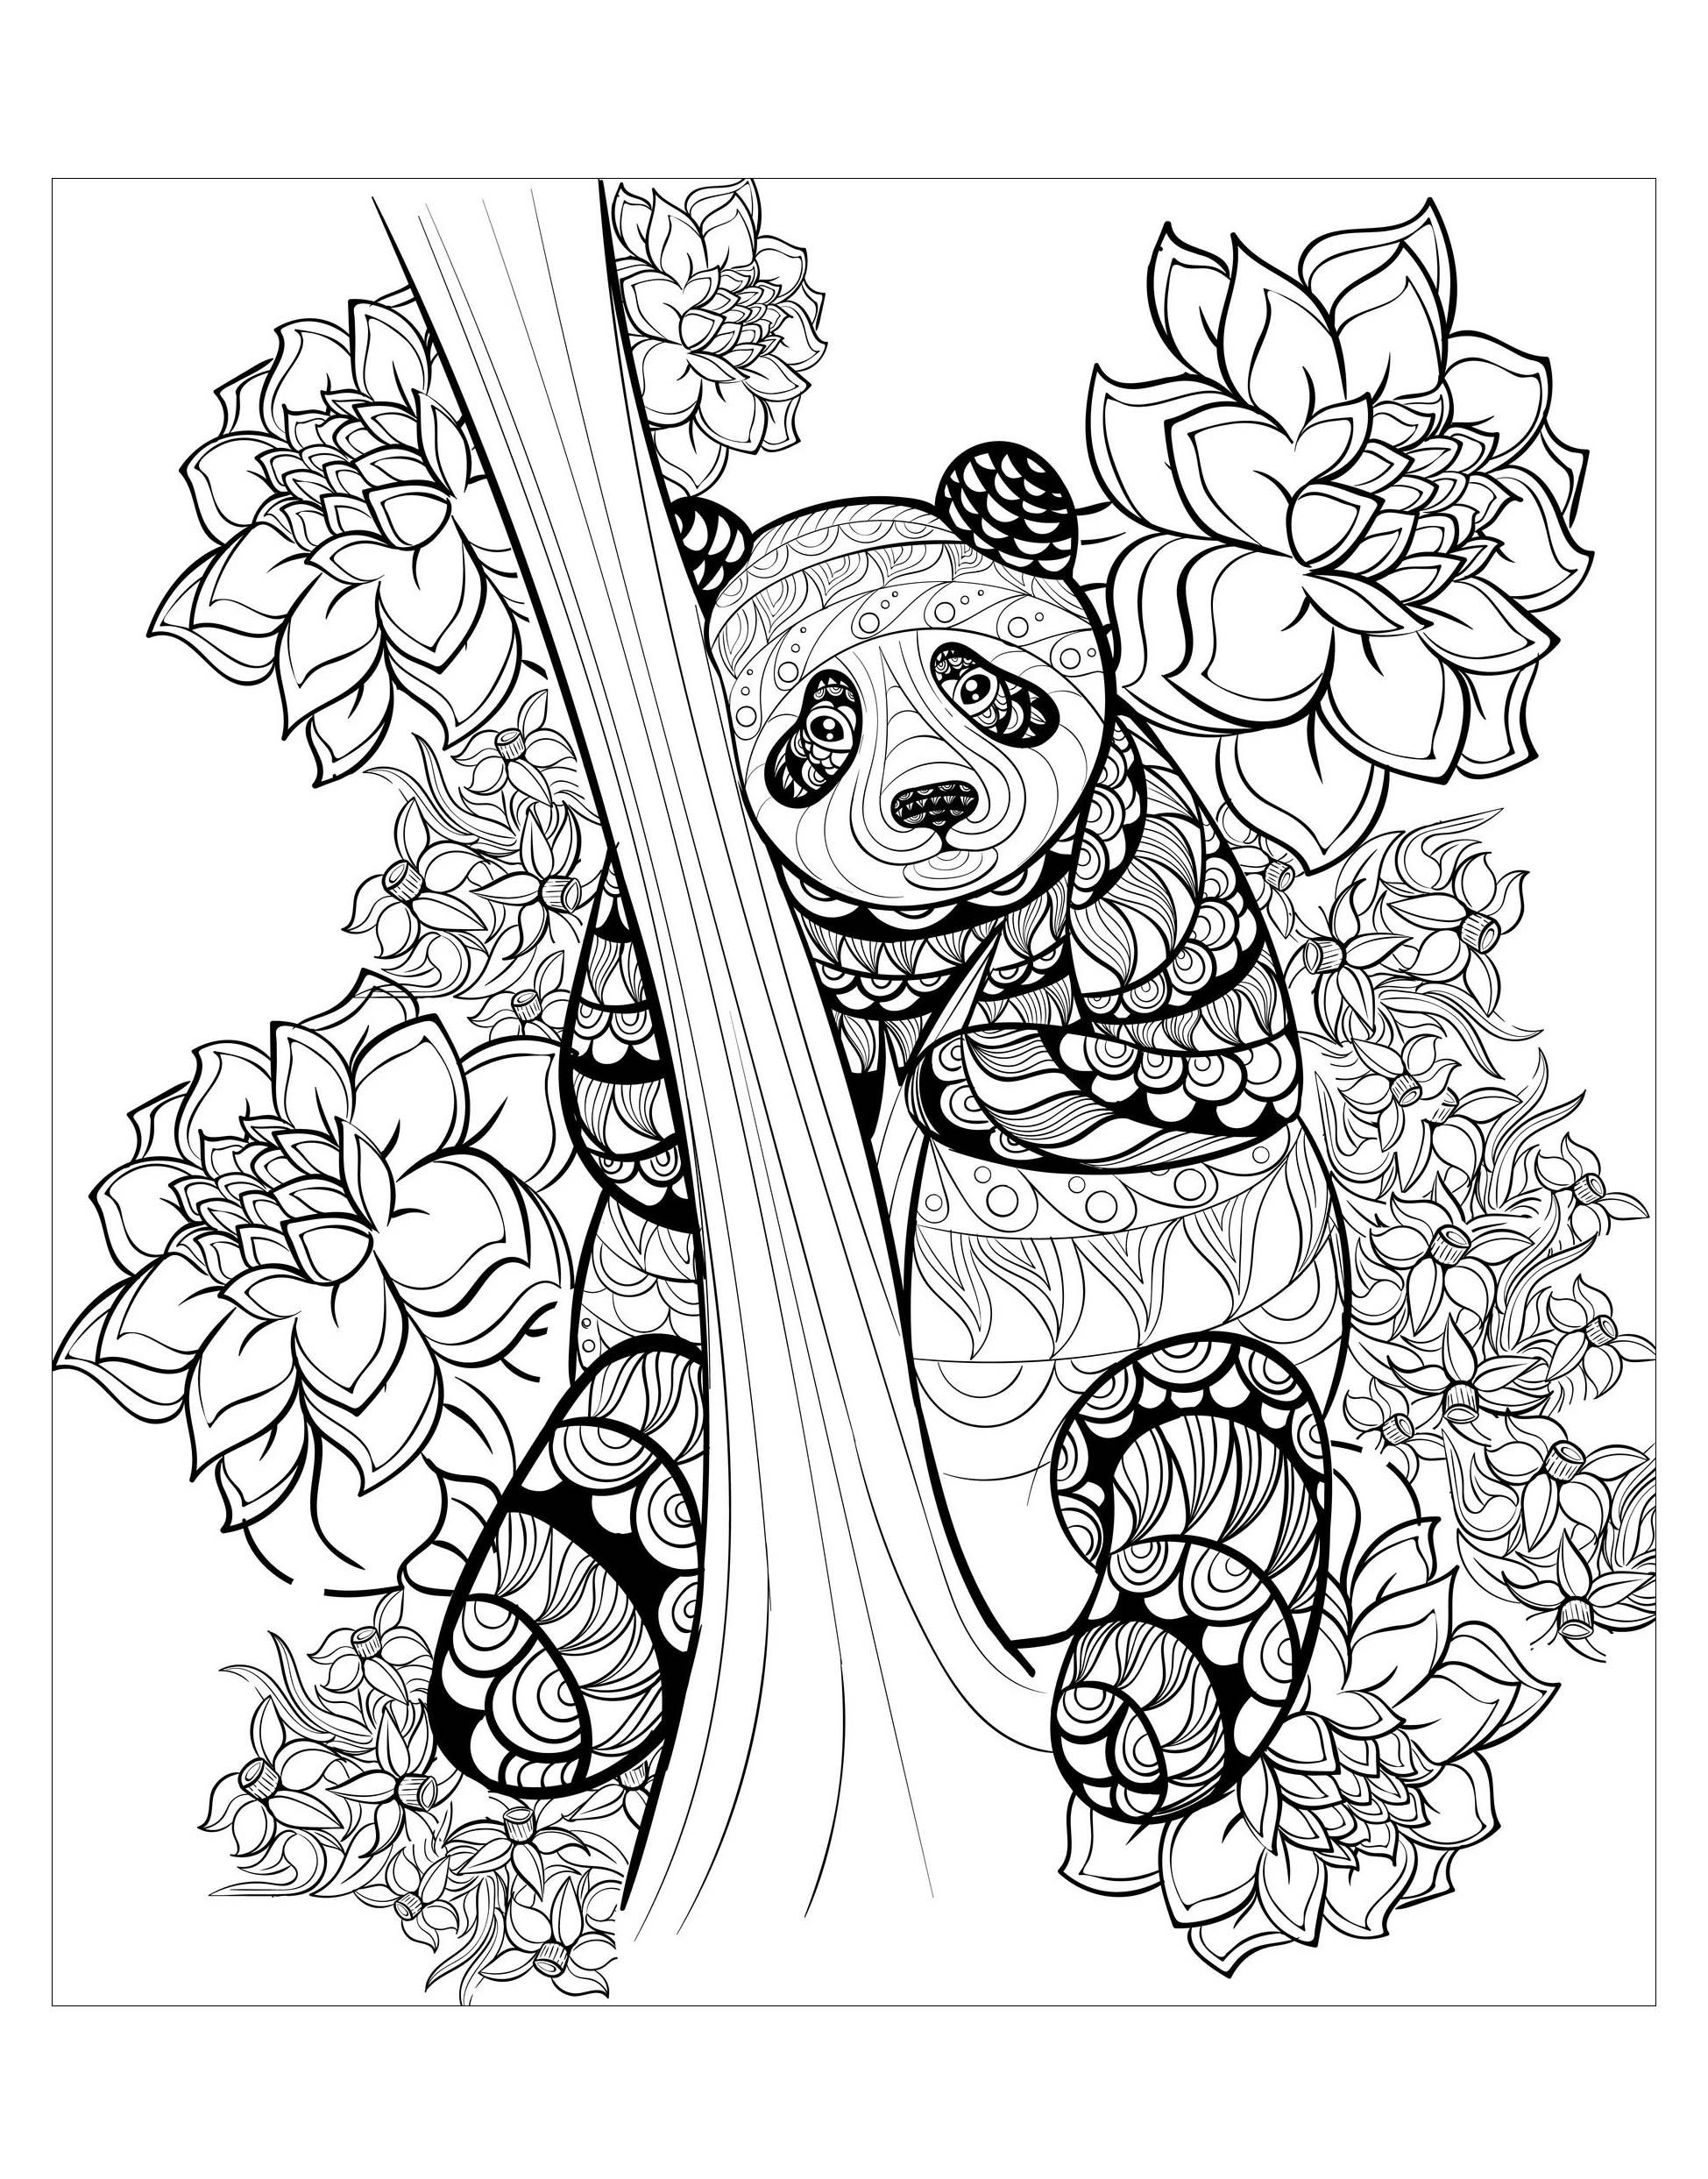 Pandas To Print For Free